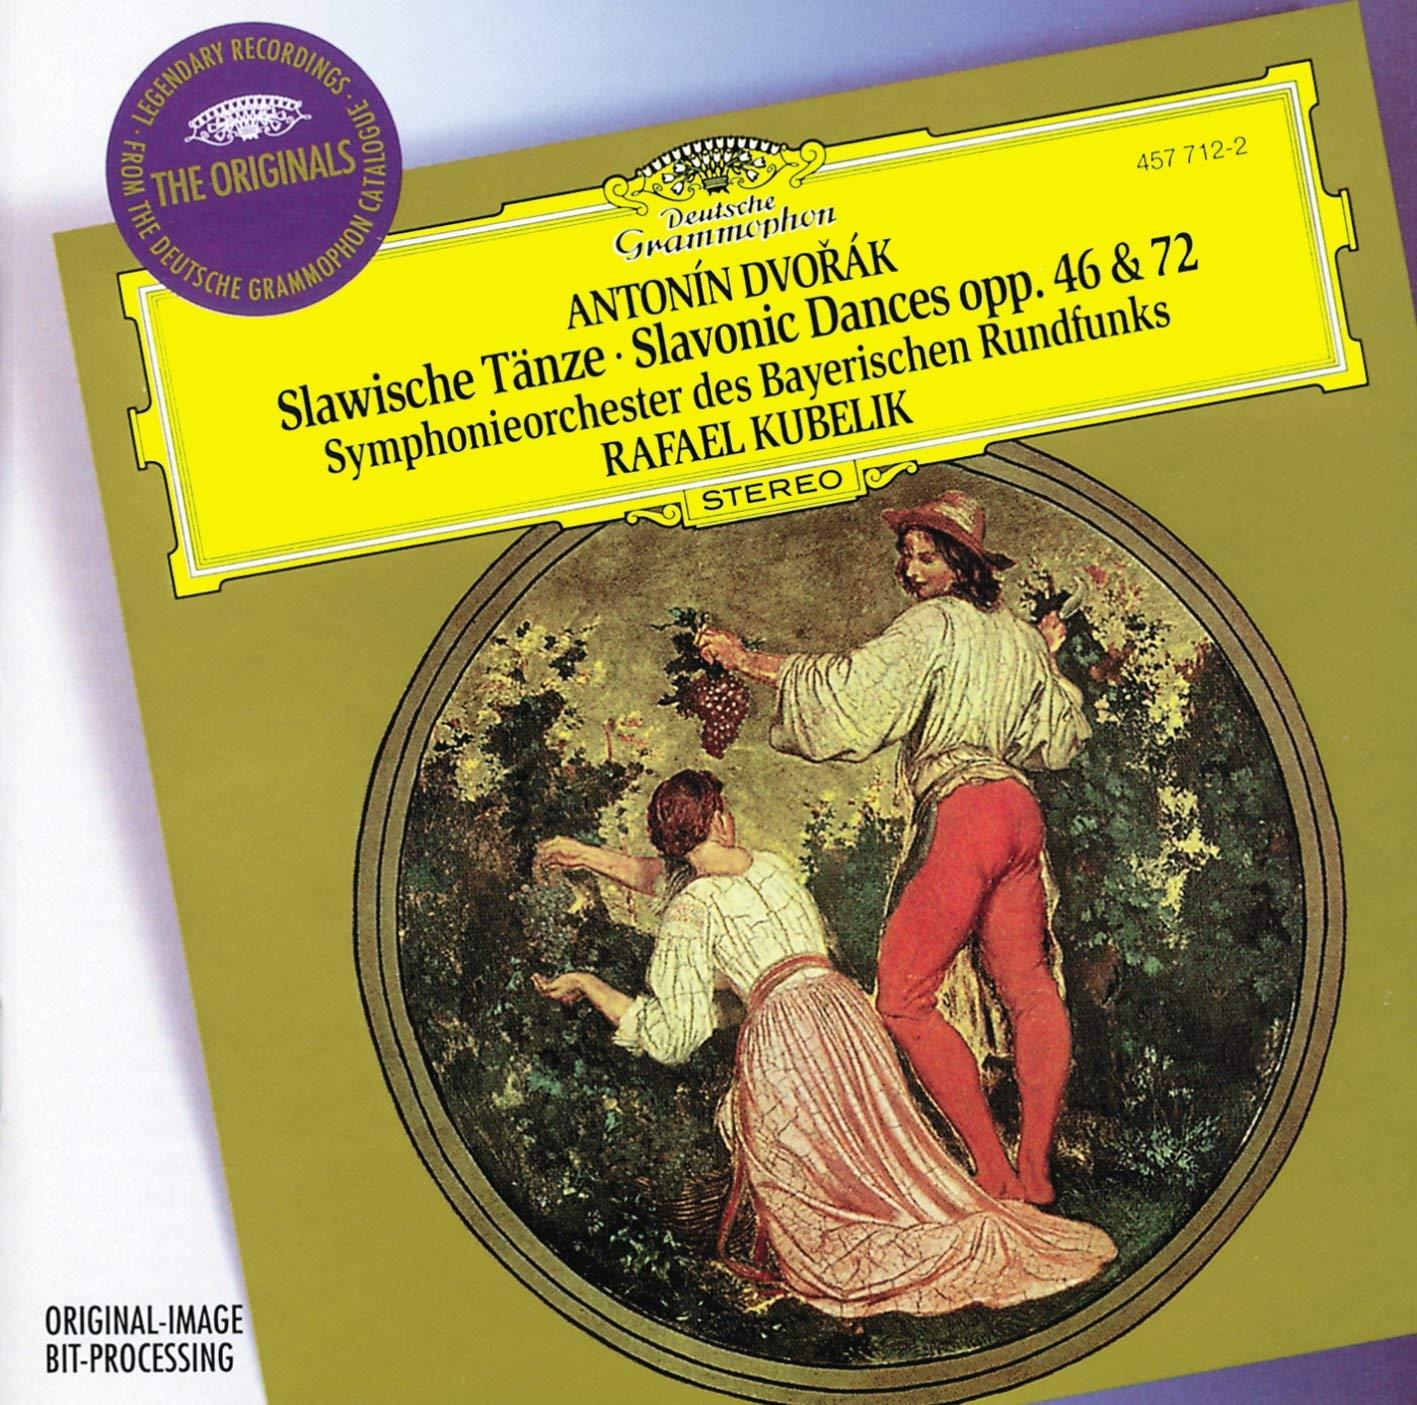 Dvorak: Slavonic Dances Opp. 46 & 72